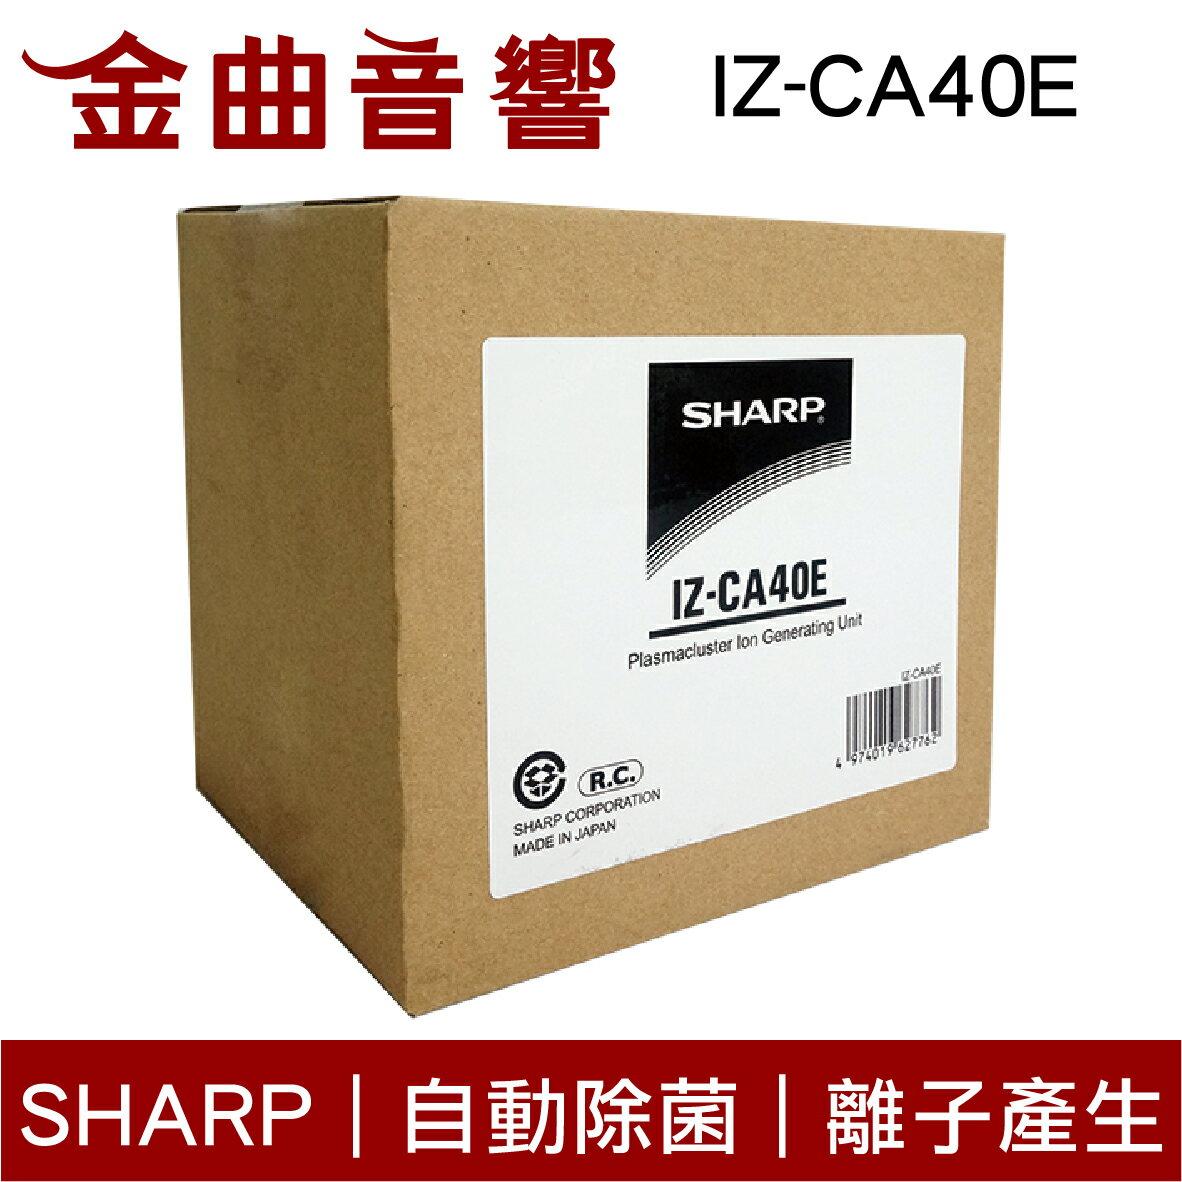 SHARP 夏普 IZ-CA40E 自動除菌離子產生器交換元件 | 金曲音響